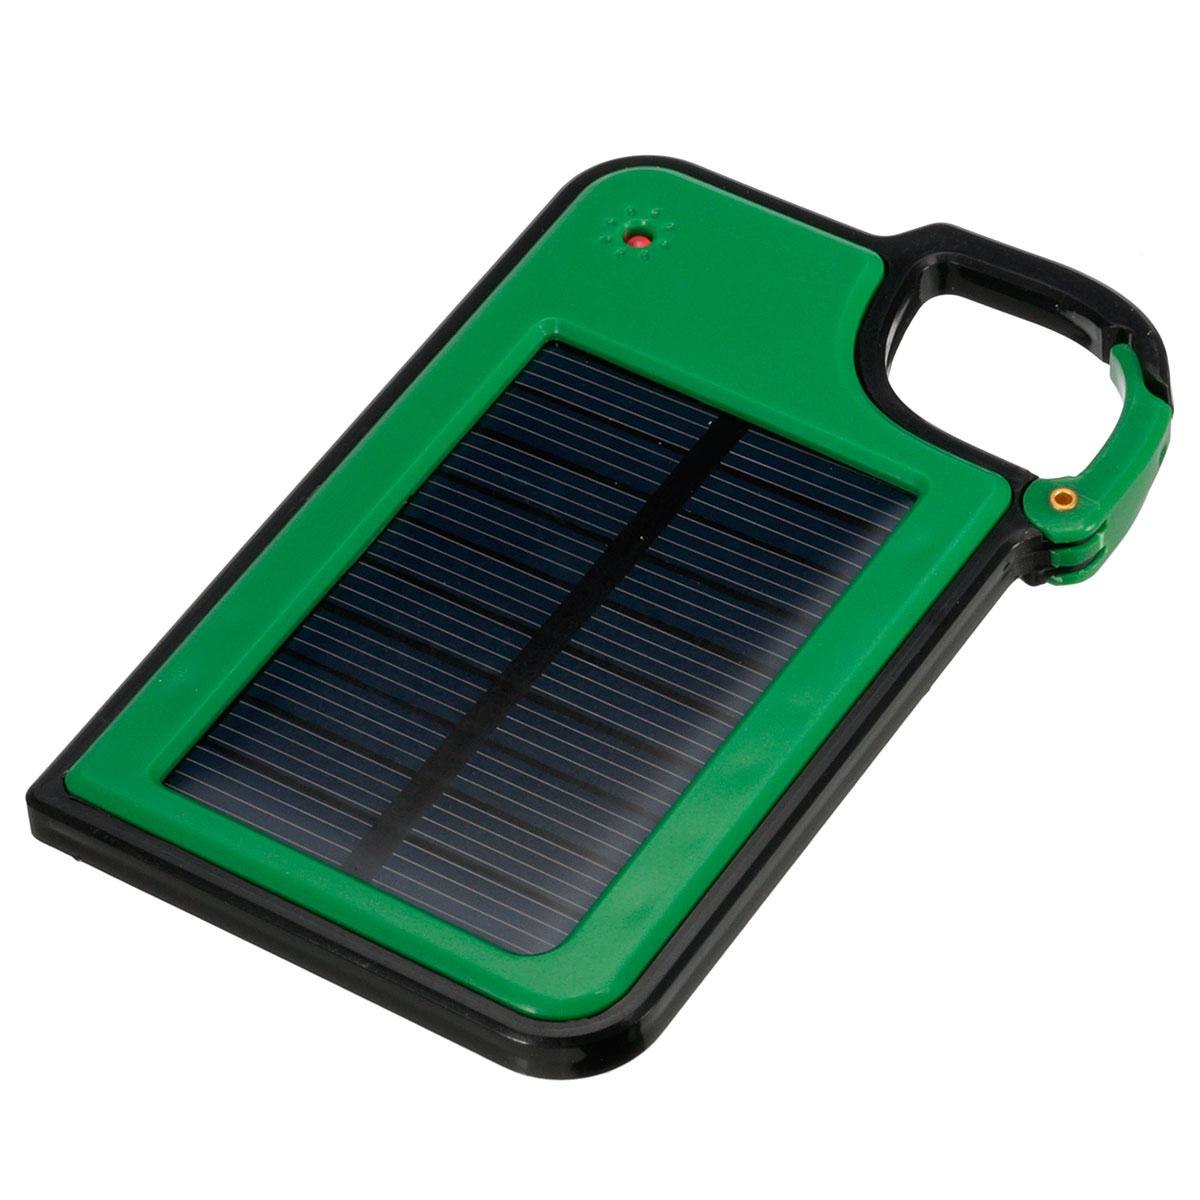 extern solar panel ladeger t power bank usb batterie akku tab f r iphone samsung ebay. Black Bedroom Furniture Sets. Home Design Ideas